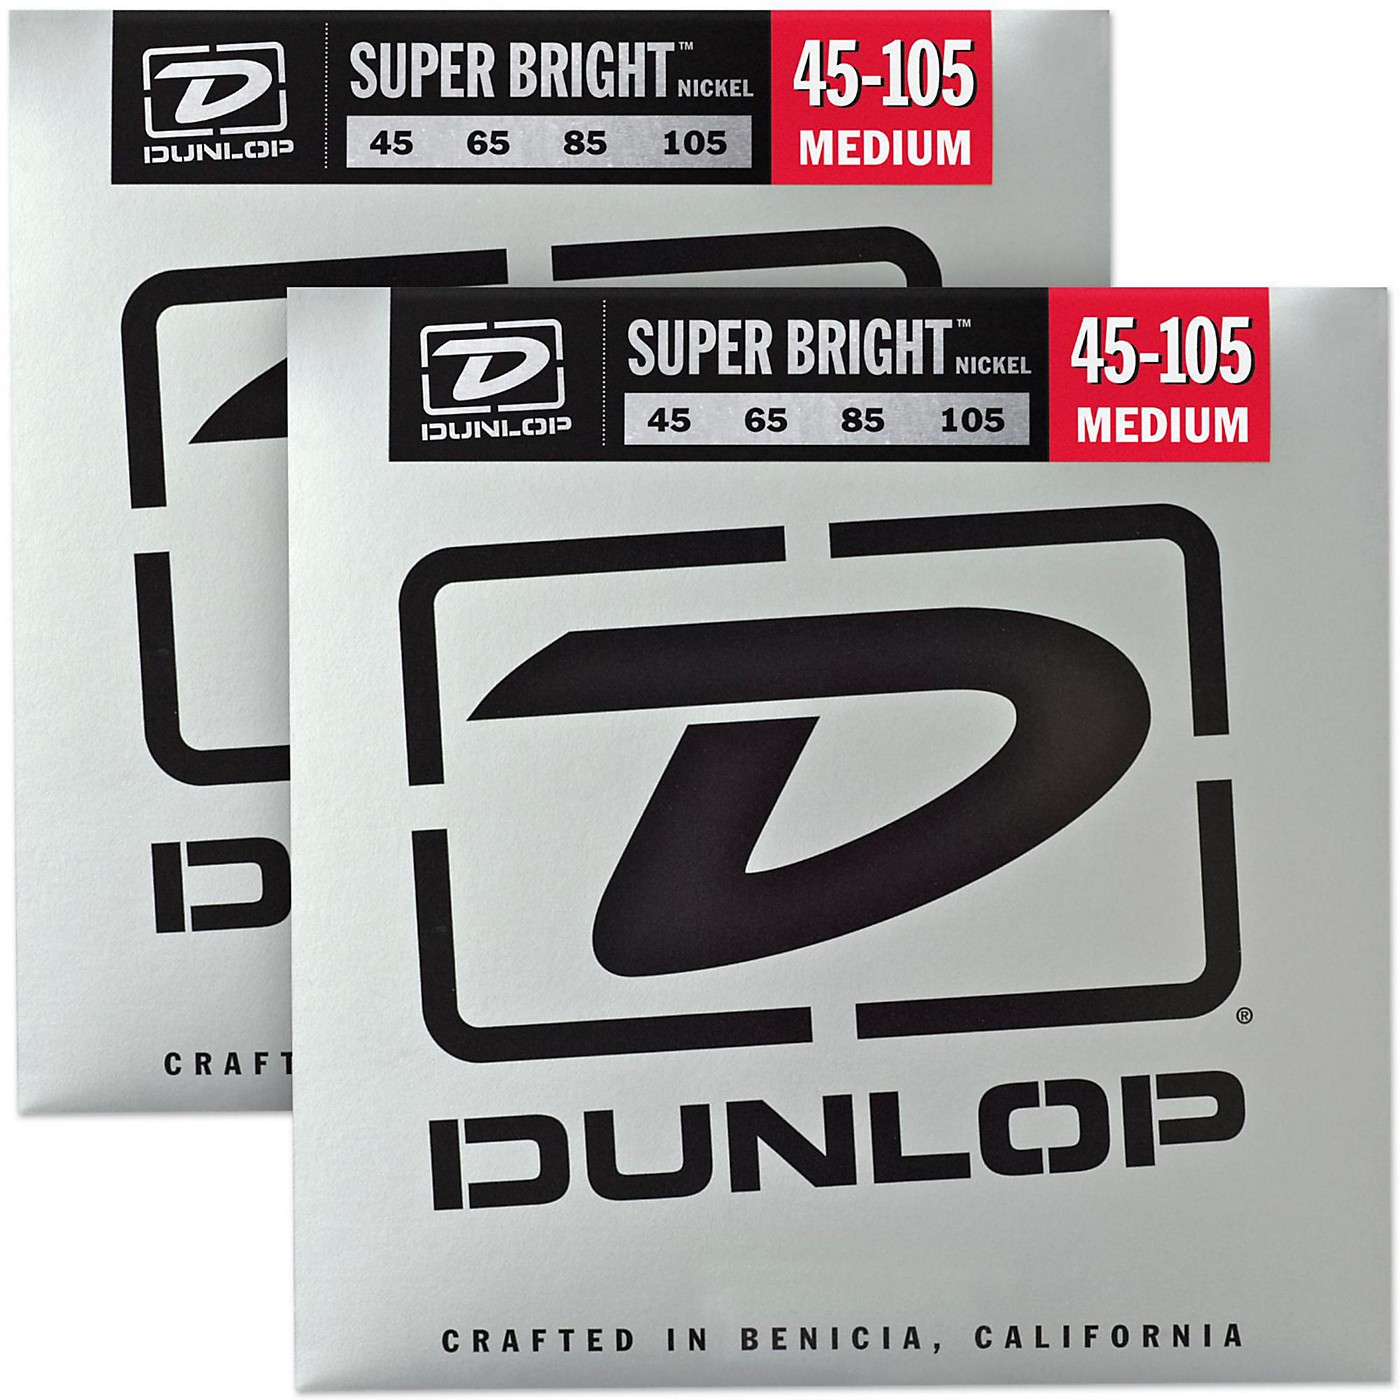 Dunlop Super Bright Nickel Medium 4-String Bass Guitar Strings (4-105) 2-Pack thumbnail